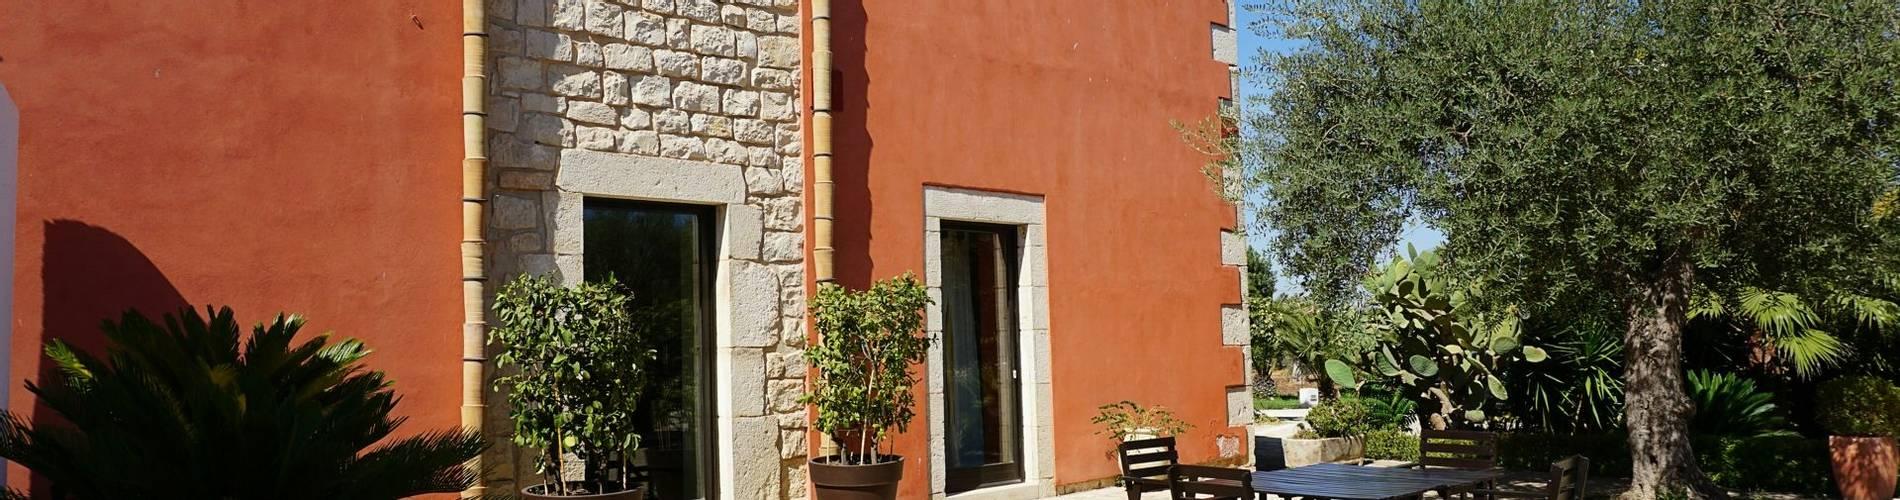 Cambiocavallo, Sicily, Italy (5).jpg